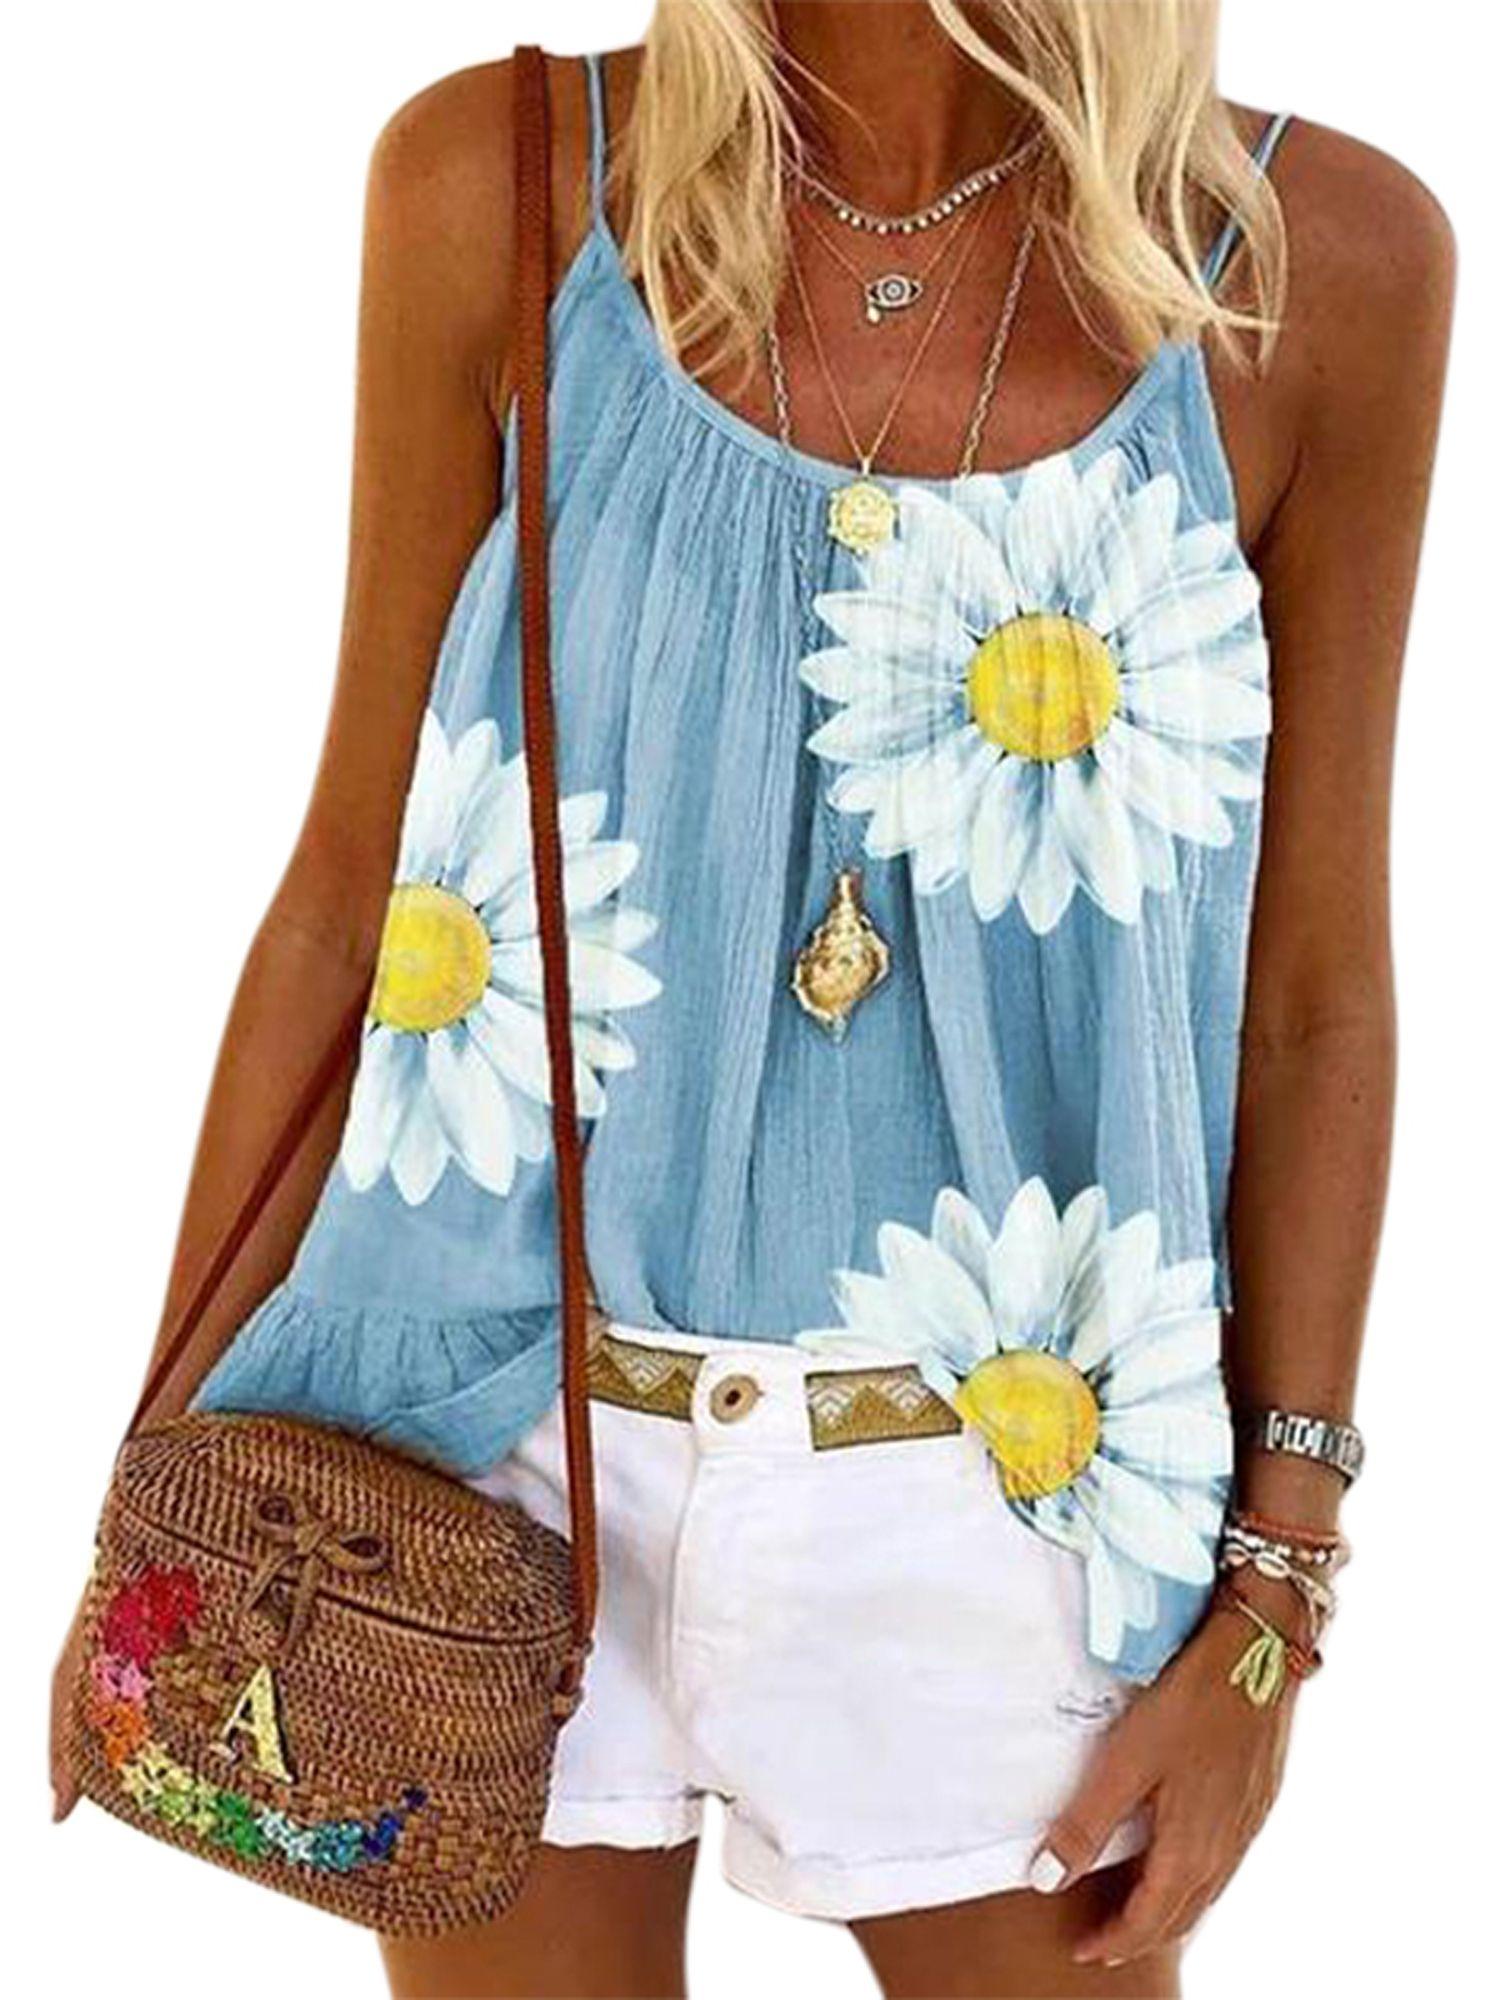 Wodstyle Women S Floral Vest Summer Tank Tops Beach Cami Loose Shirt Plus Size Blouse Walmart Com In 2020 Casual Tank Tops Casual Tanks Printed Tank Tops [ 2000 x 1500 Pixel ]